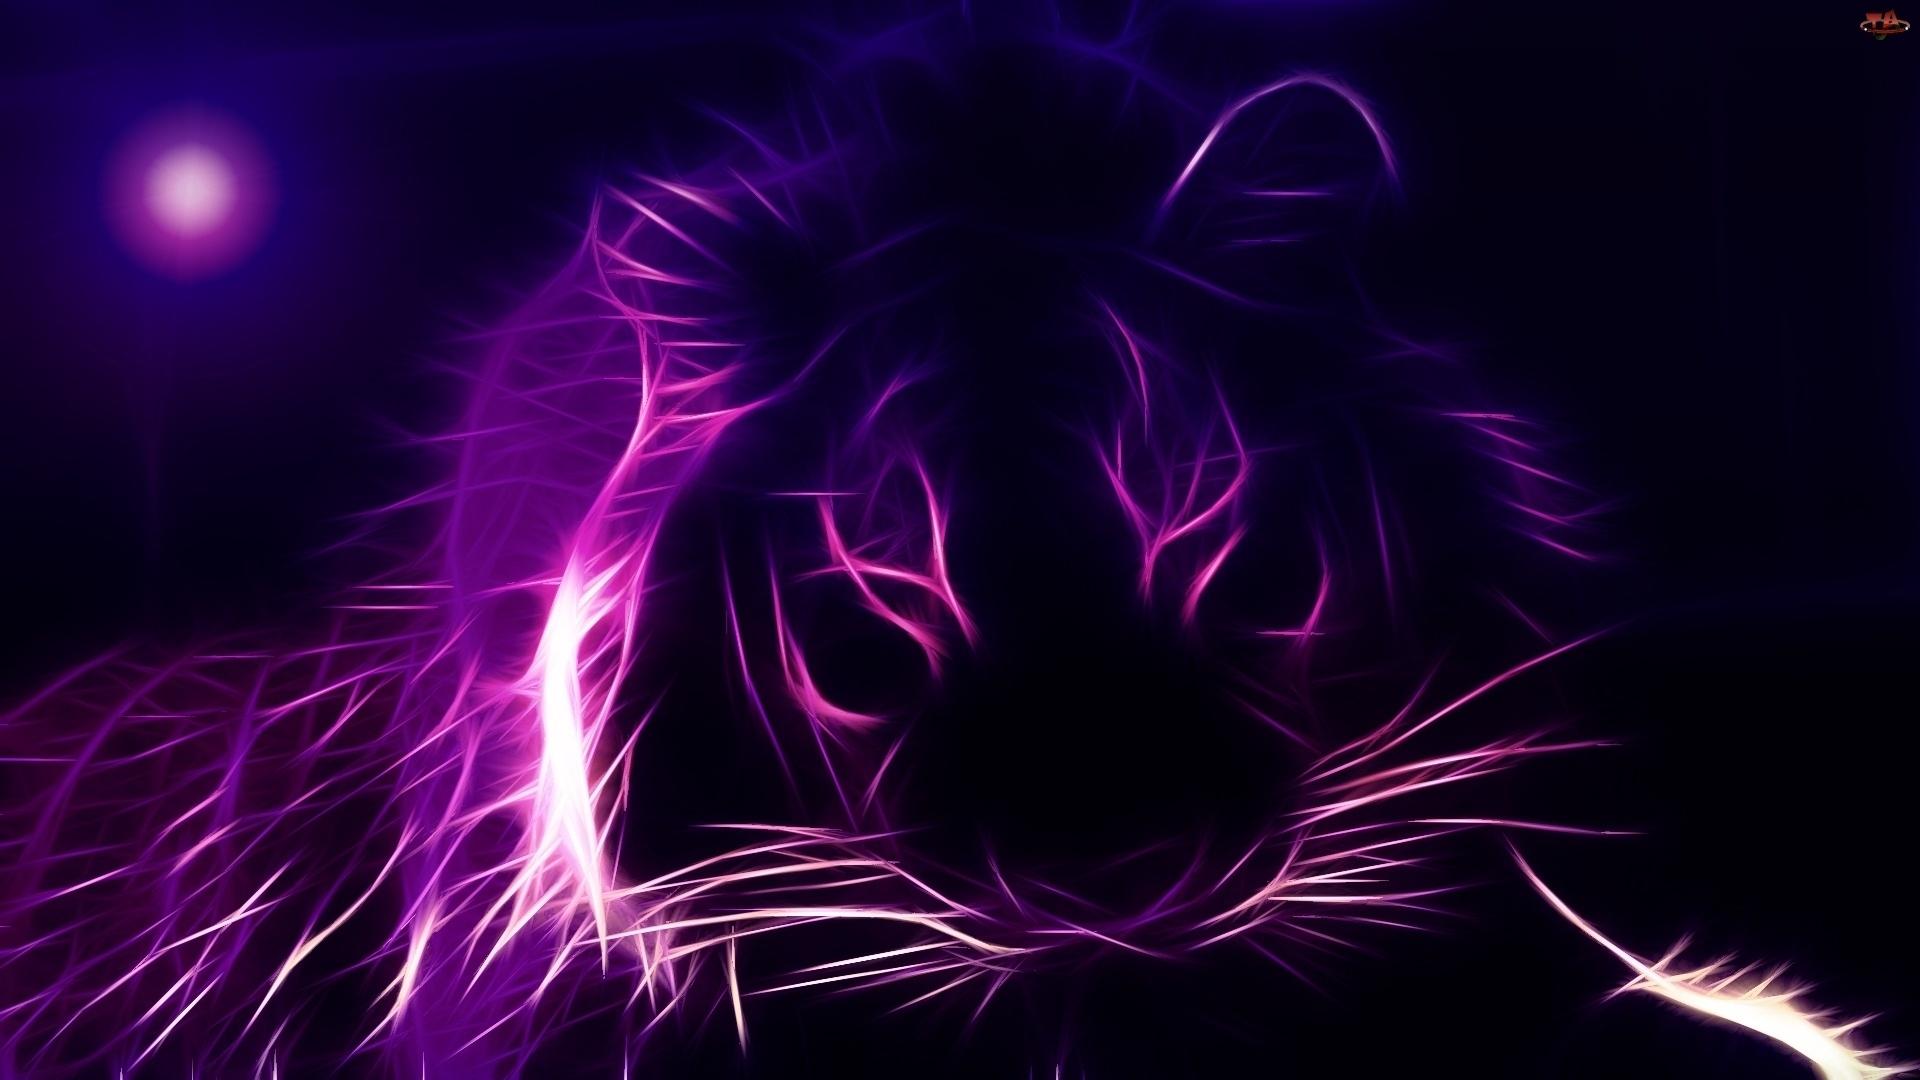 Purple Tiger Wallpaper   Best Wallpapers 1920x1080